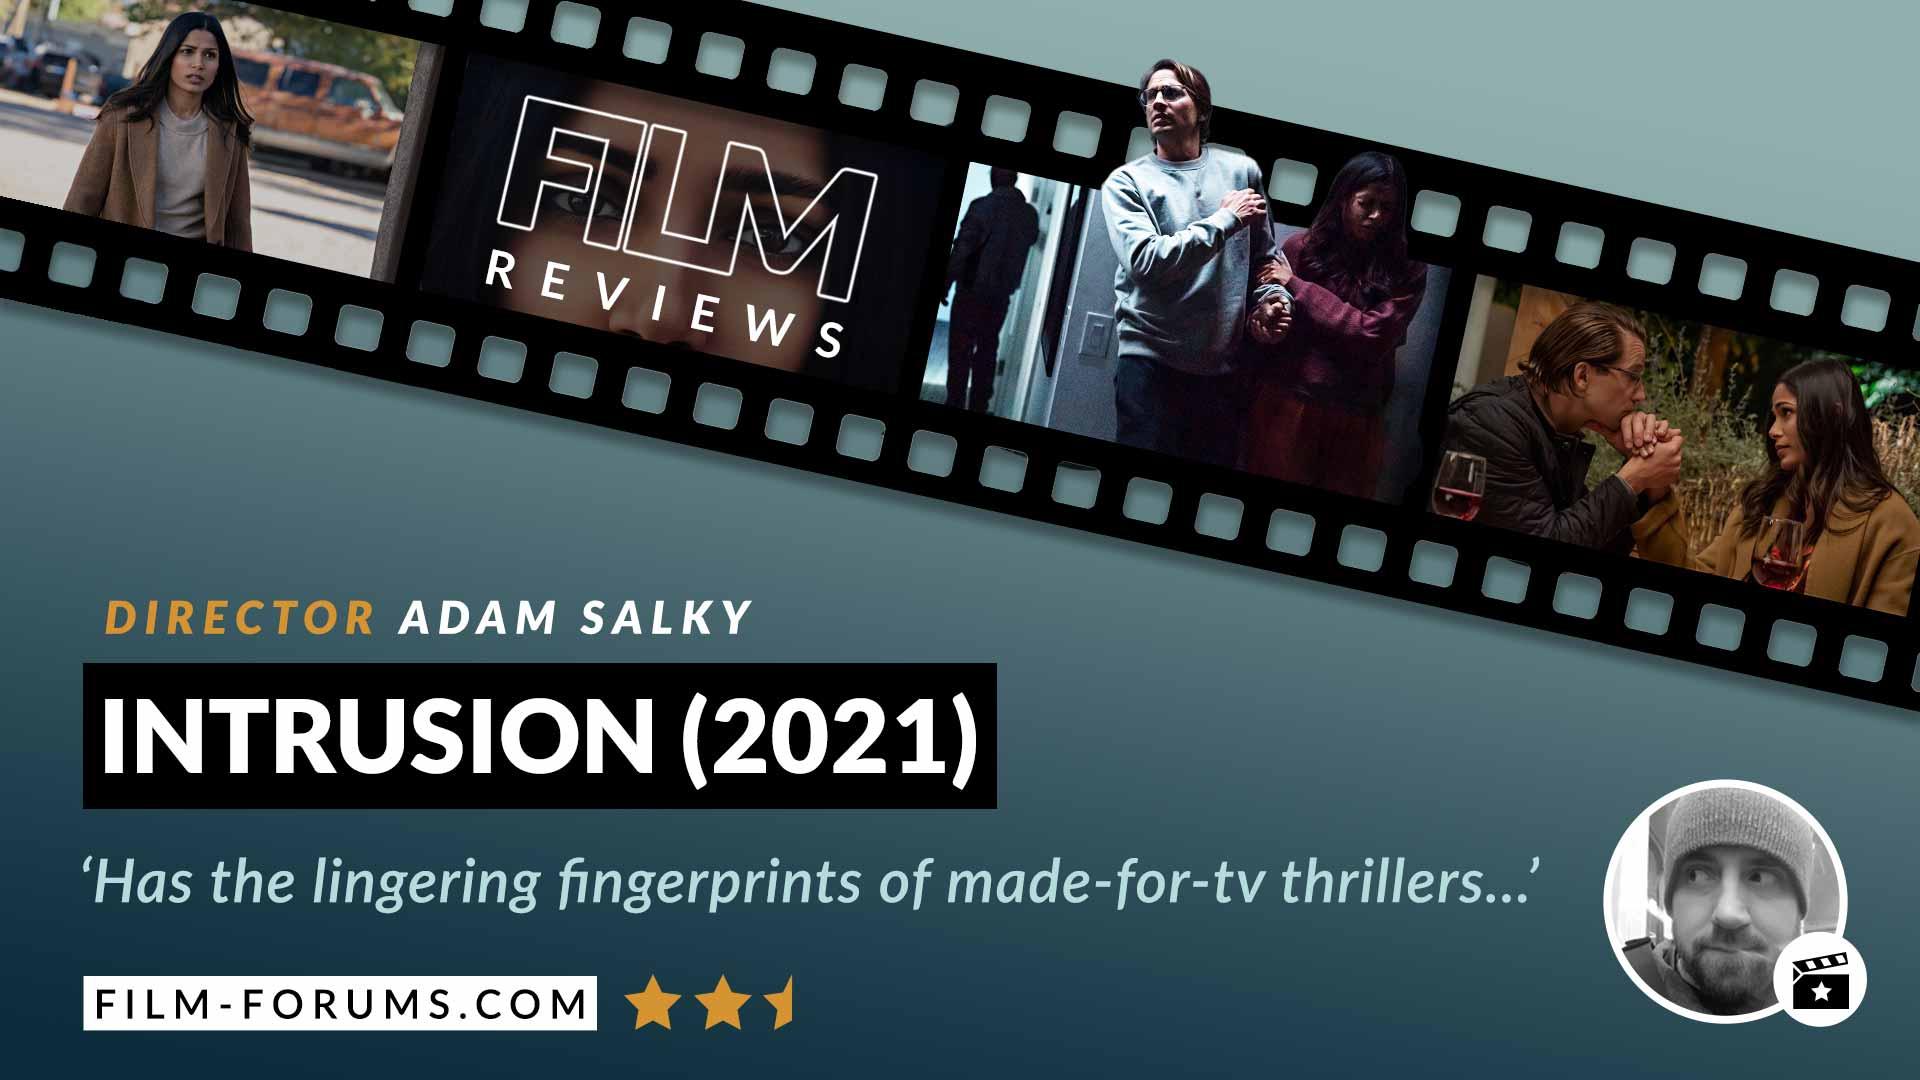 Intrusion 2021 Freida Pinto Film Review